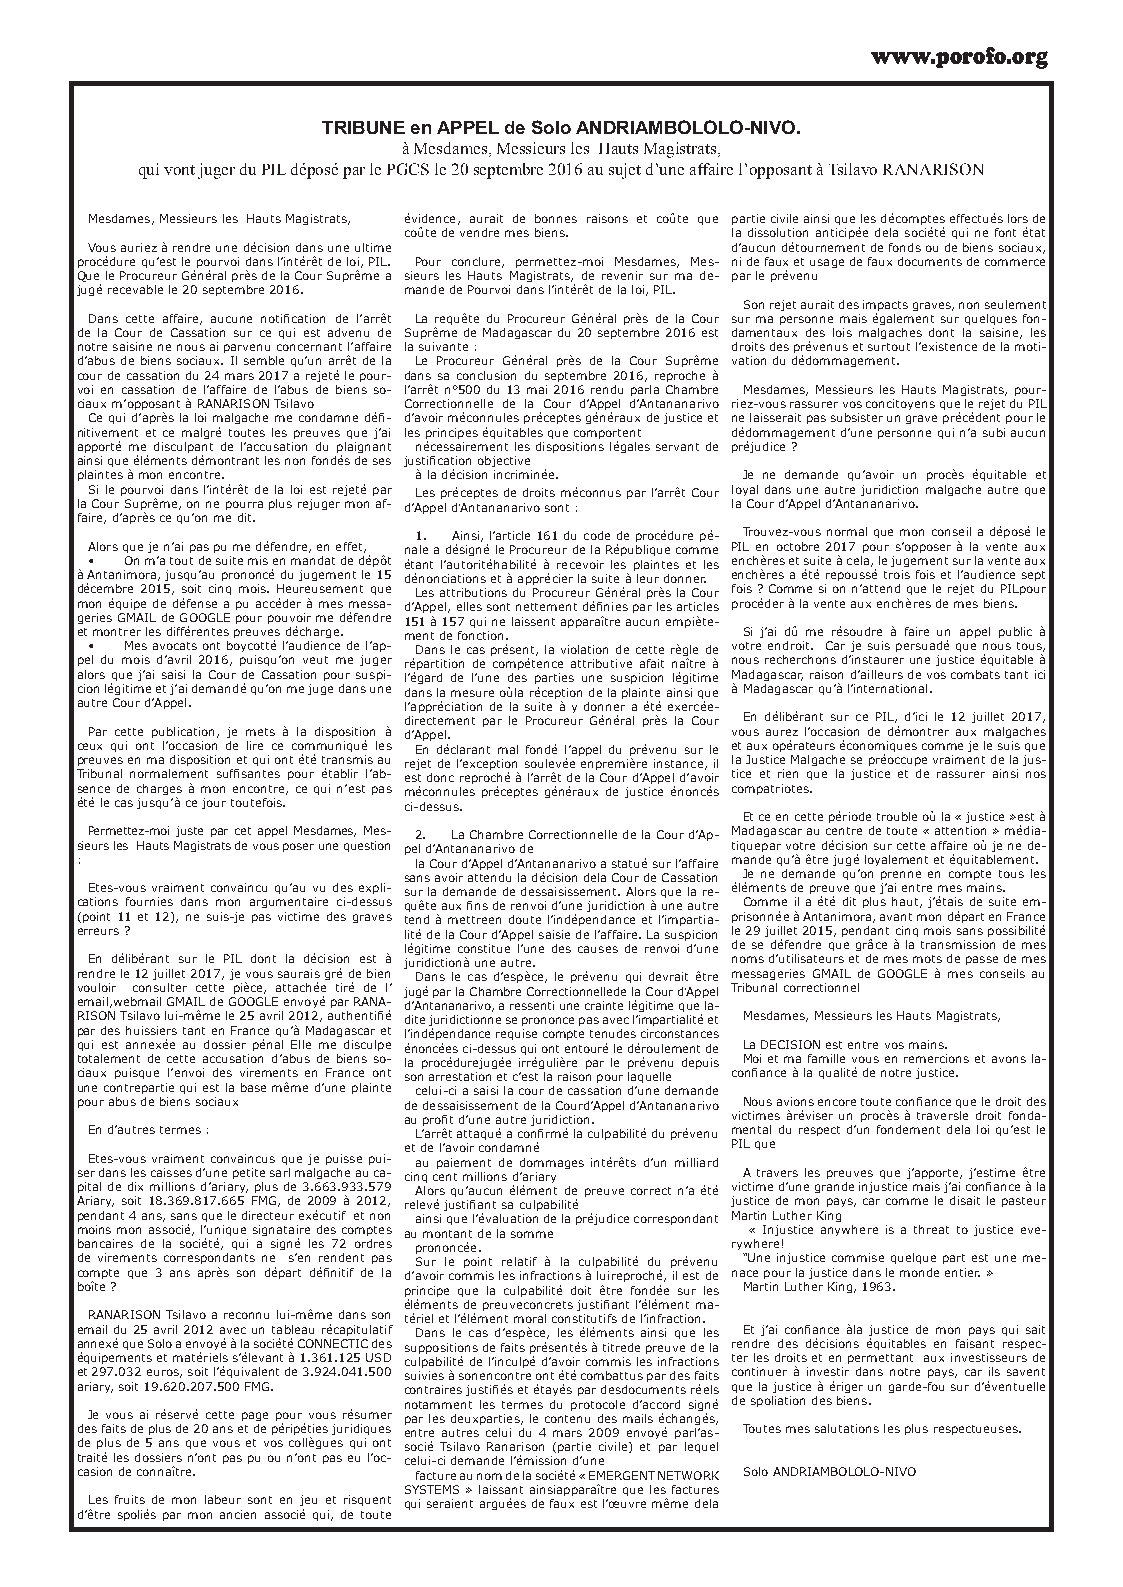 Appel aux avocats de la Cour de Cassation Solo ANDRIAMBOLOLO NIVO contre RANARISON Tsilavo Page3 - Appel aux Magistrats de Madagascar